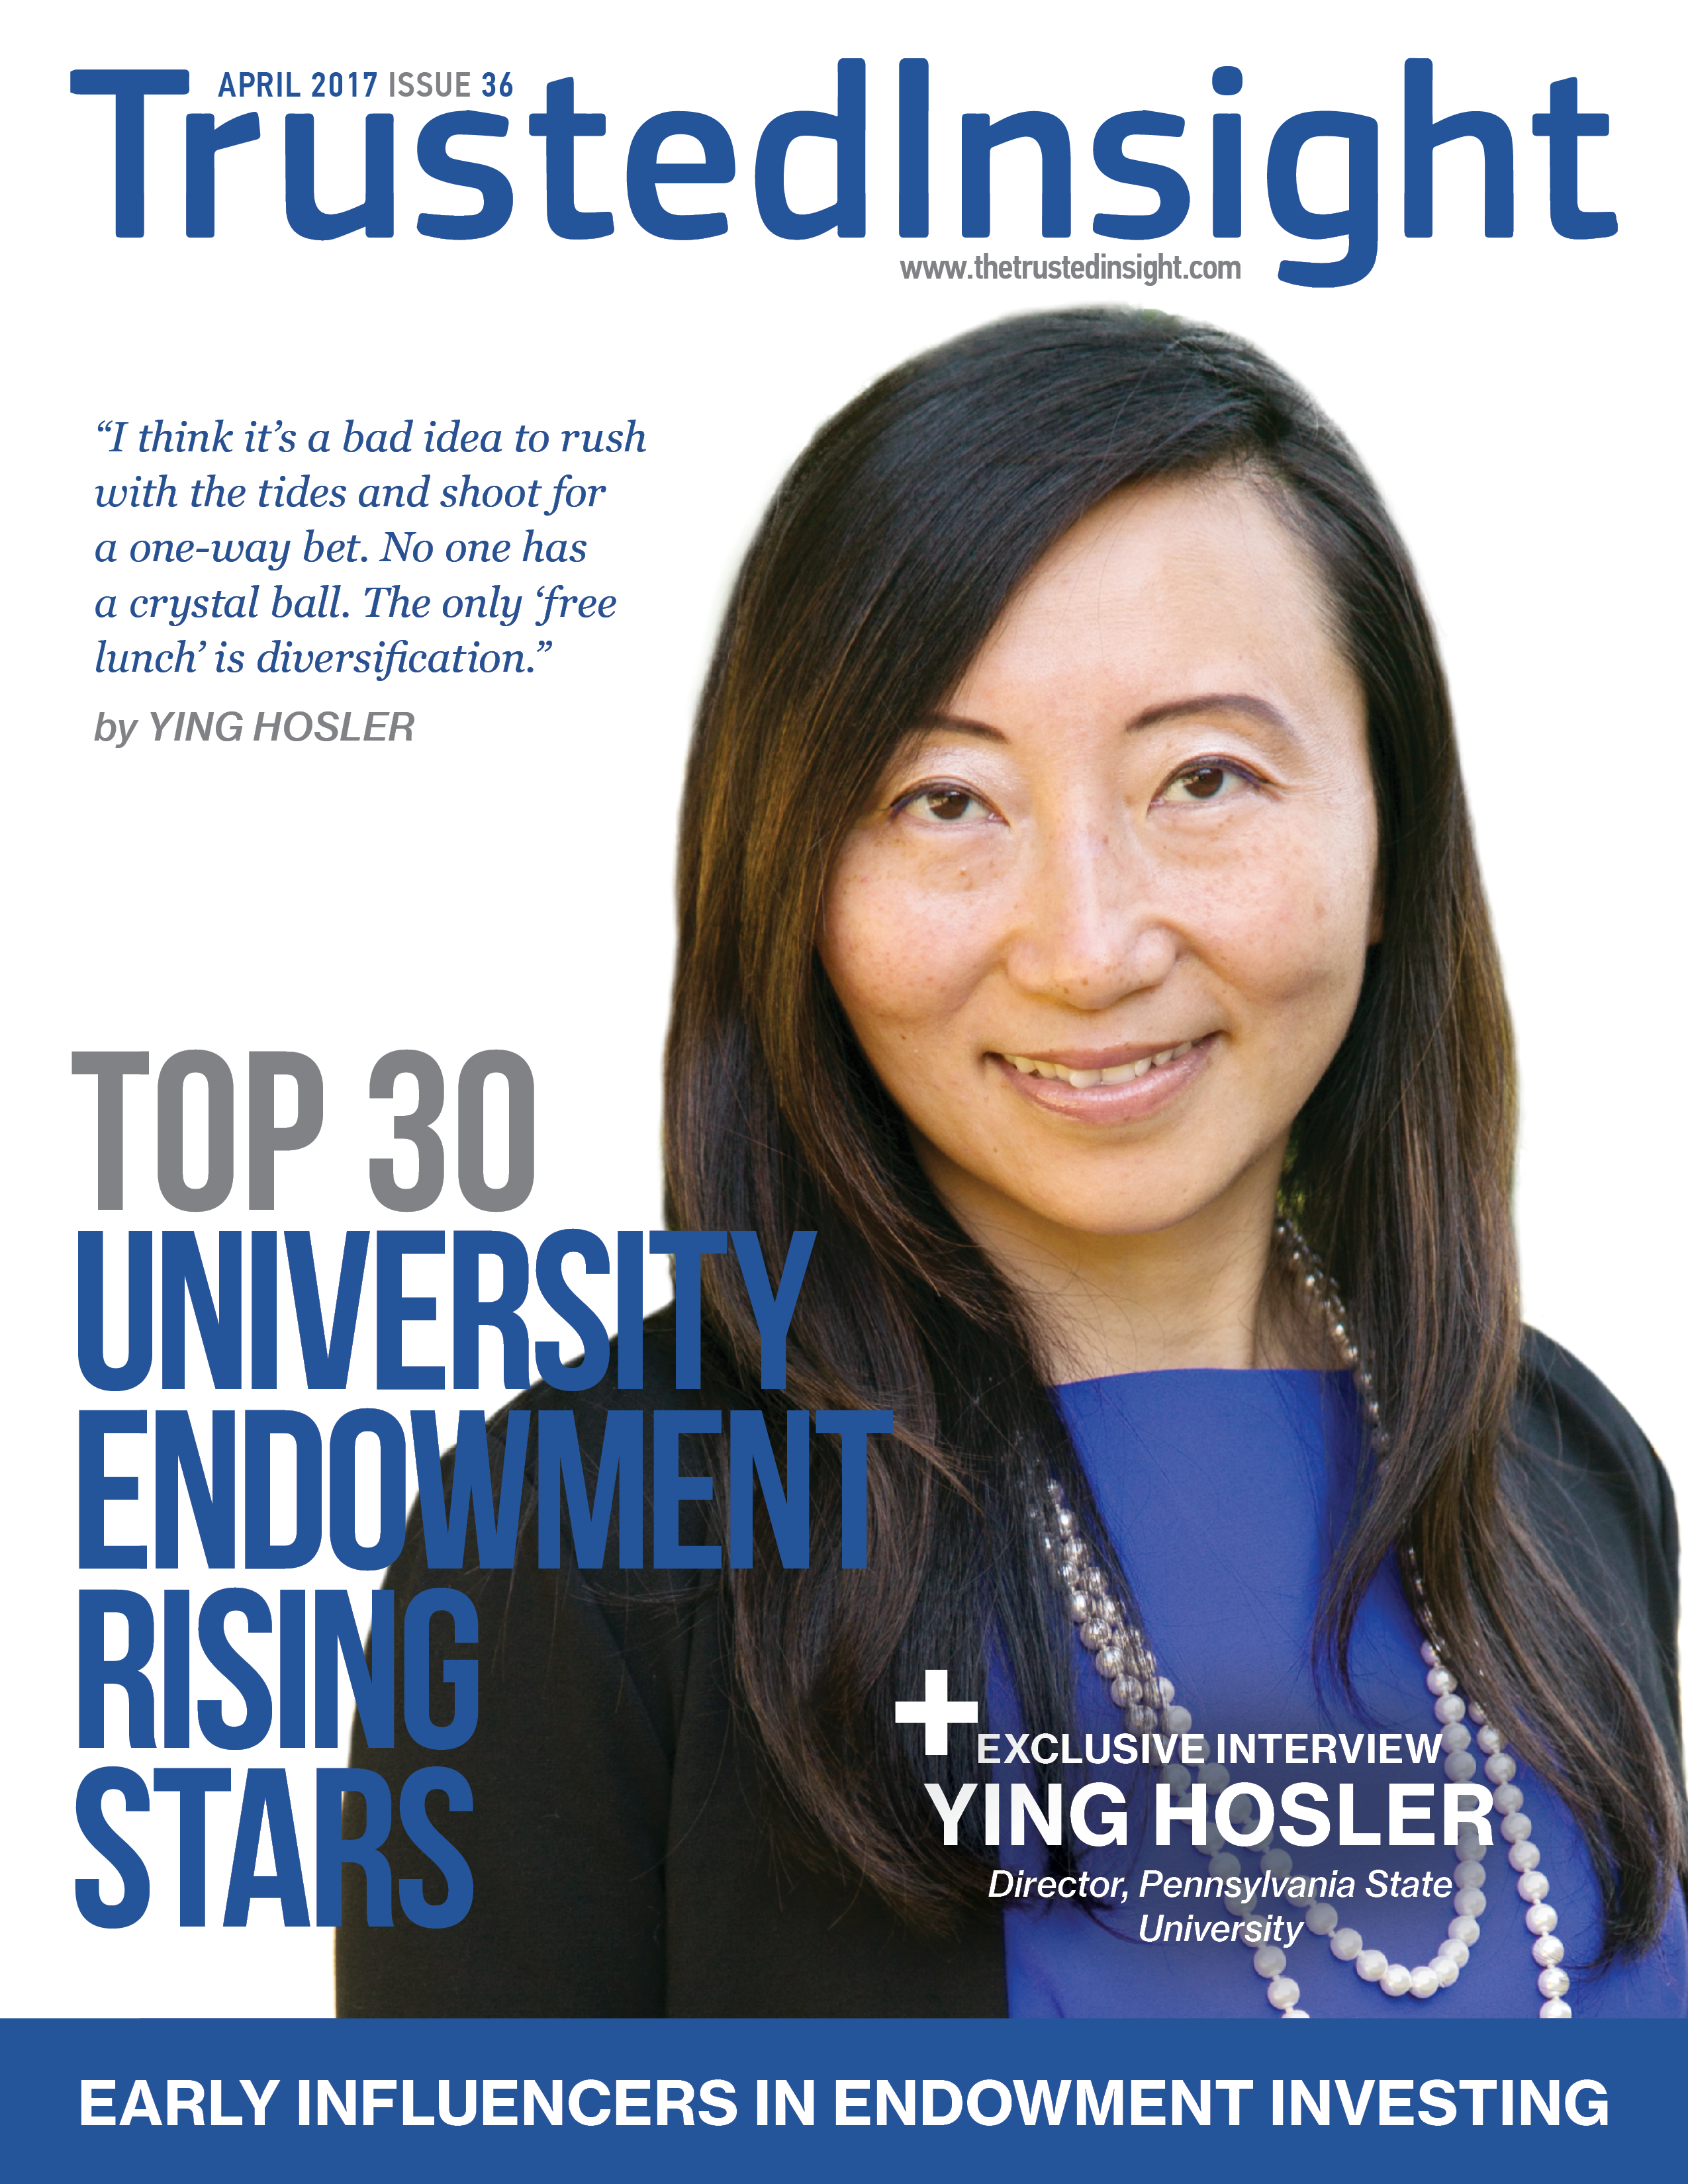 Trusted Insight   Top 30 University Endowment Rising Stars